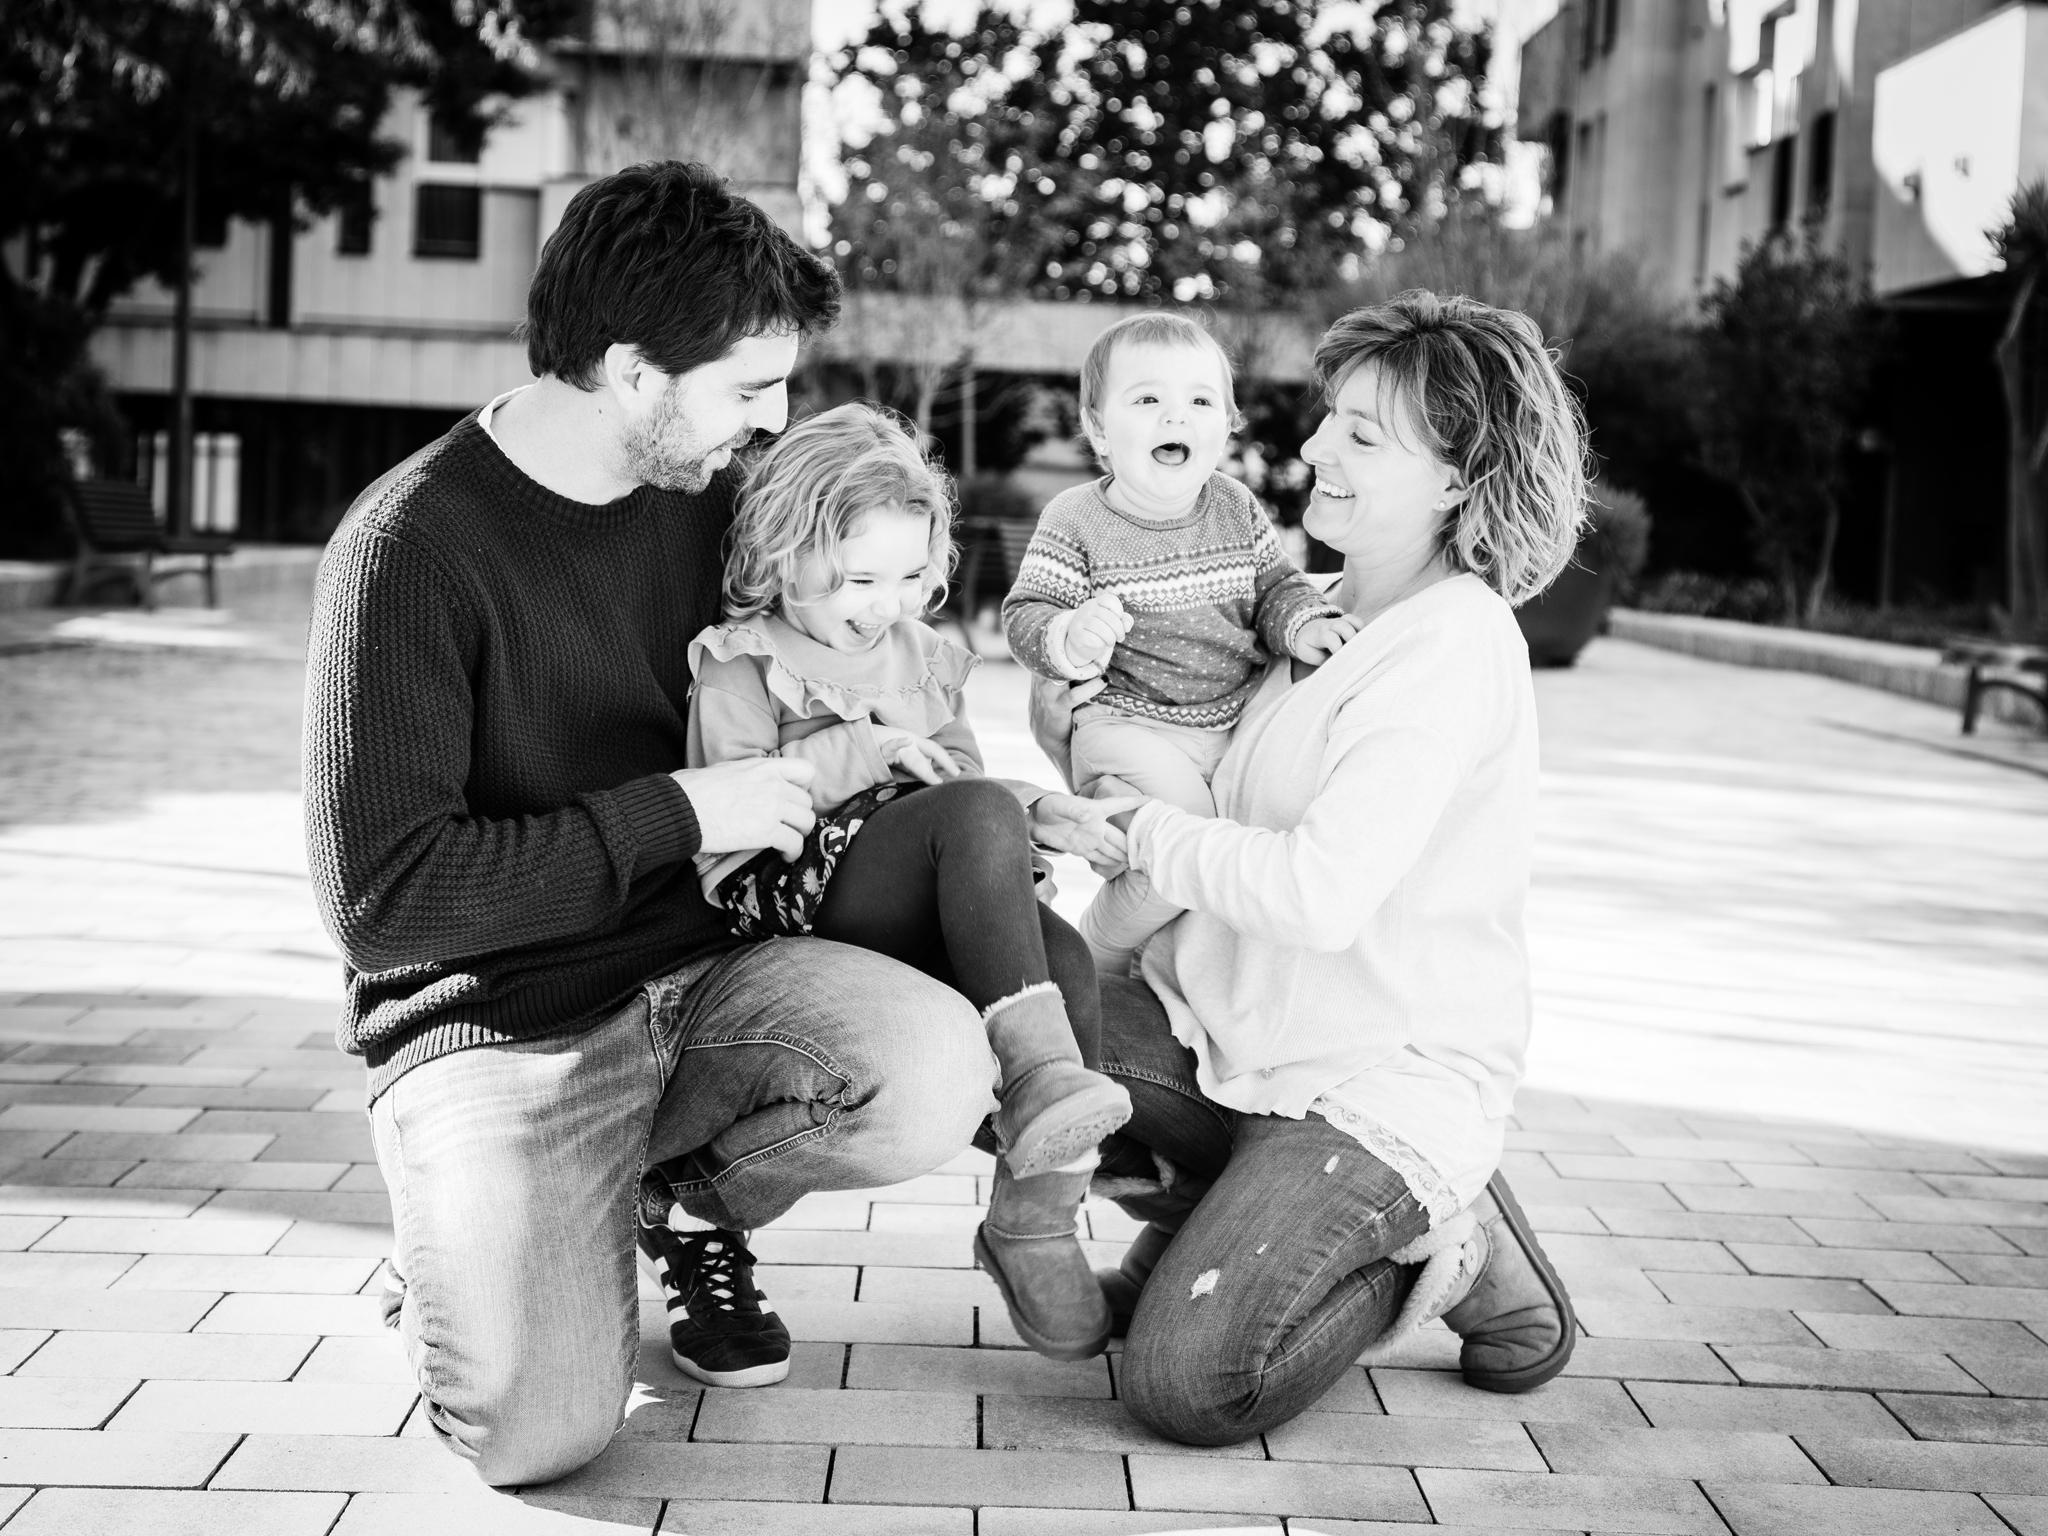 fotografia-infantil-familiar51.jpg